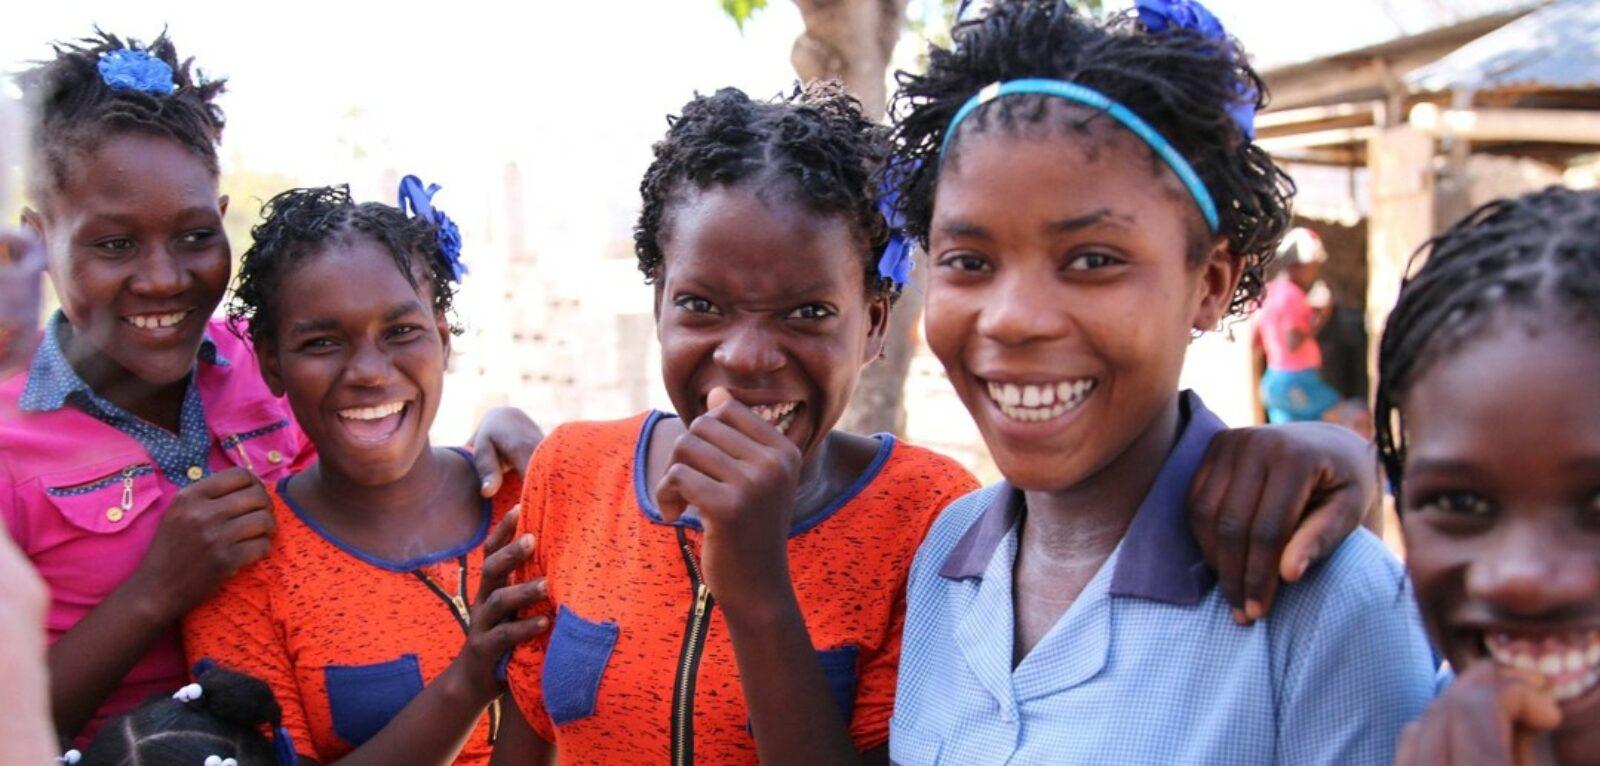 Rayjon Haiti featured image Will Power campaign